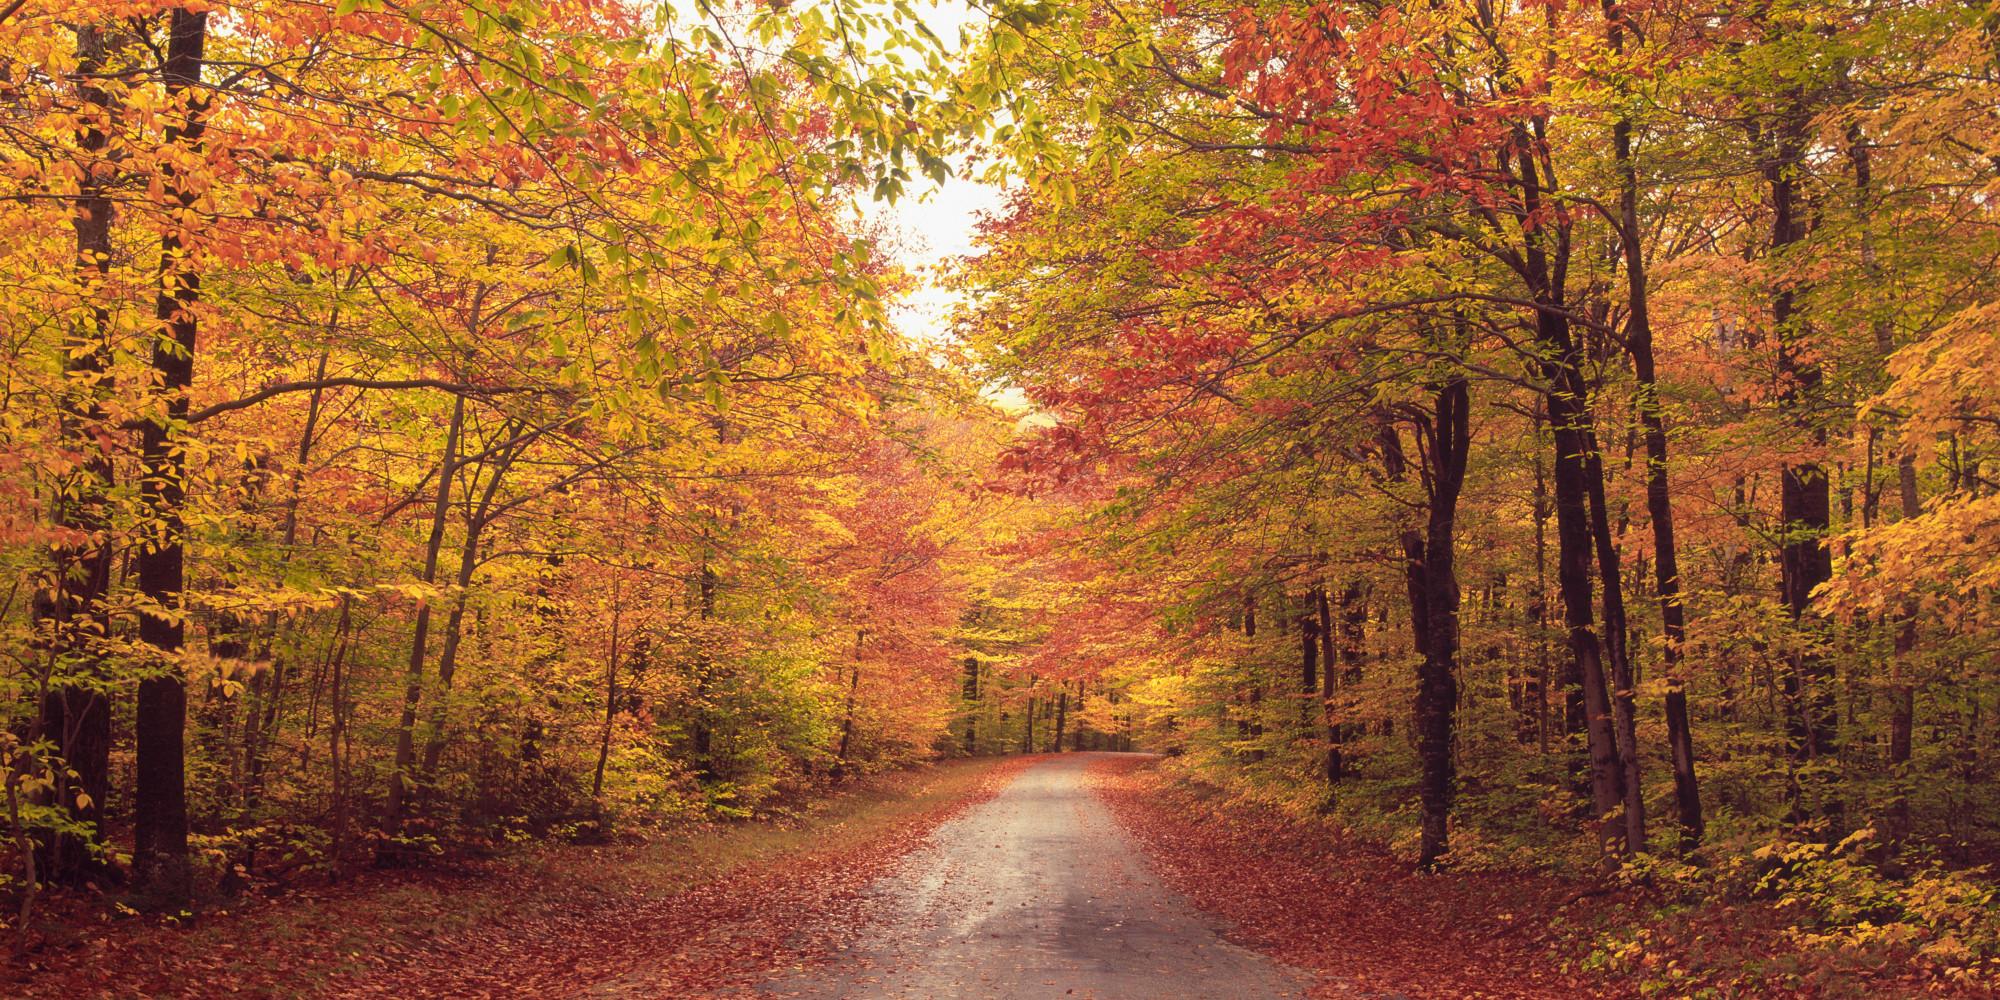 Thomas Kinkade Fall Wallpaper First Day Of Autumn Evolvingidentity